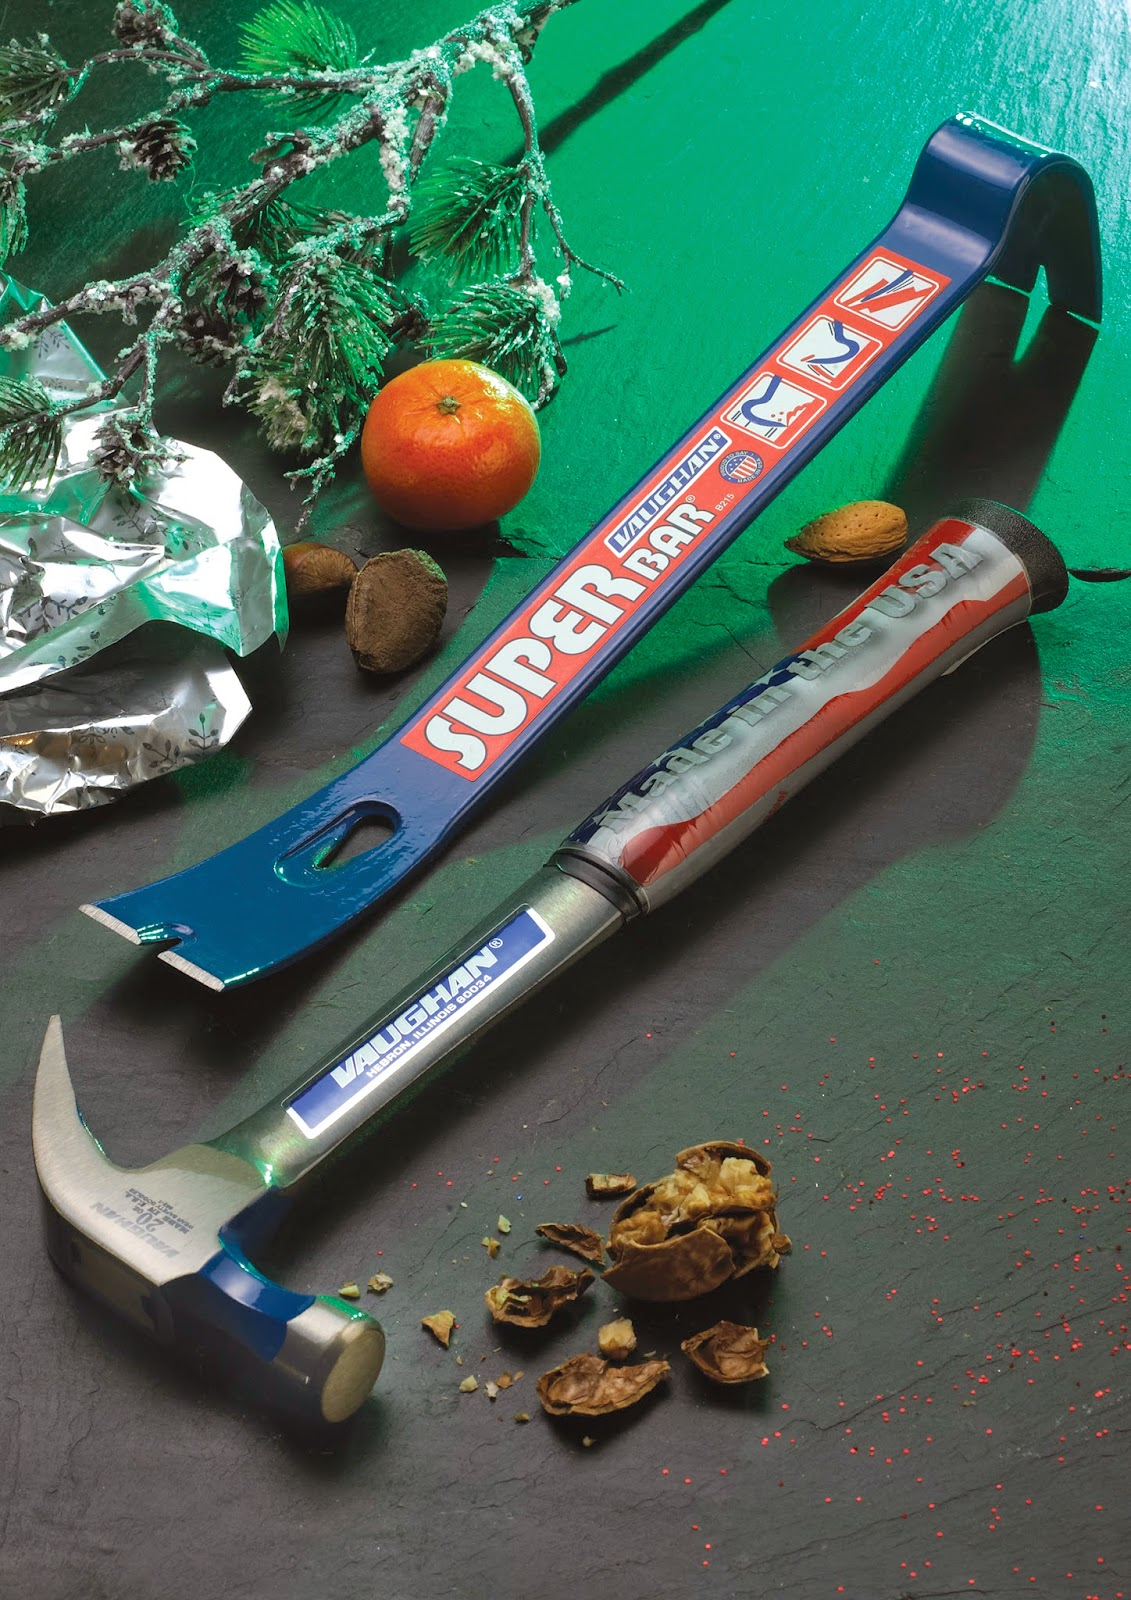 http://www.beesleyandfildes.co.uk/vaughan-20oz-hammer-with-free-15-superbar-ref-xms14hammer/